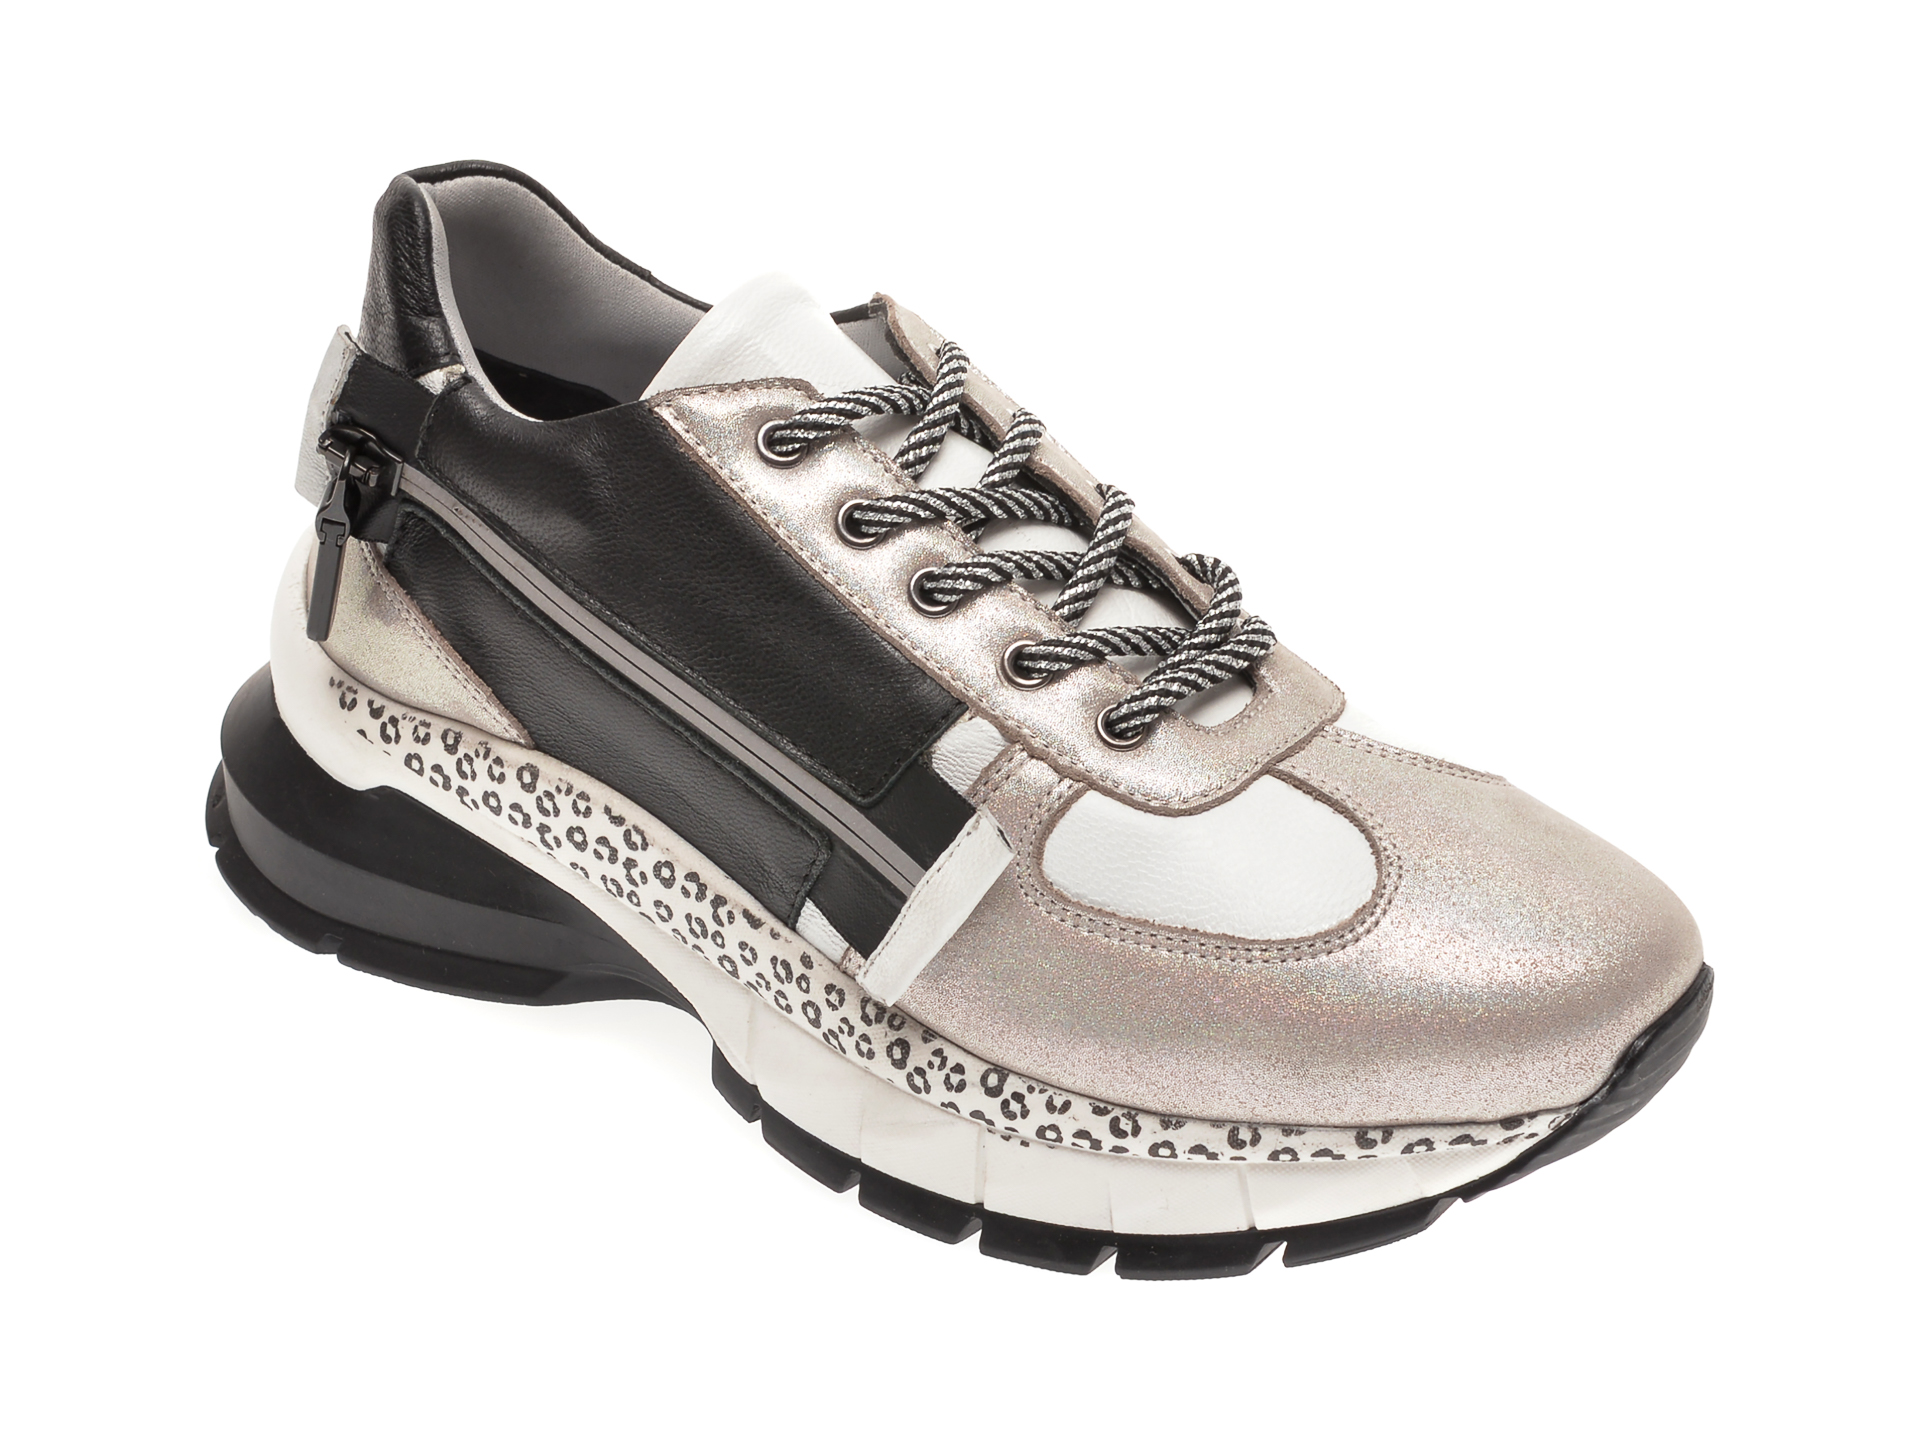 Pantofi sport BABOOS albi, 1206, din piele naturala